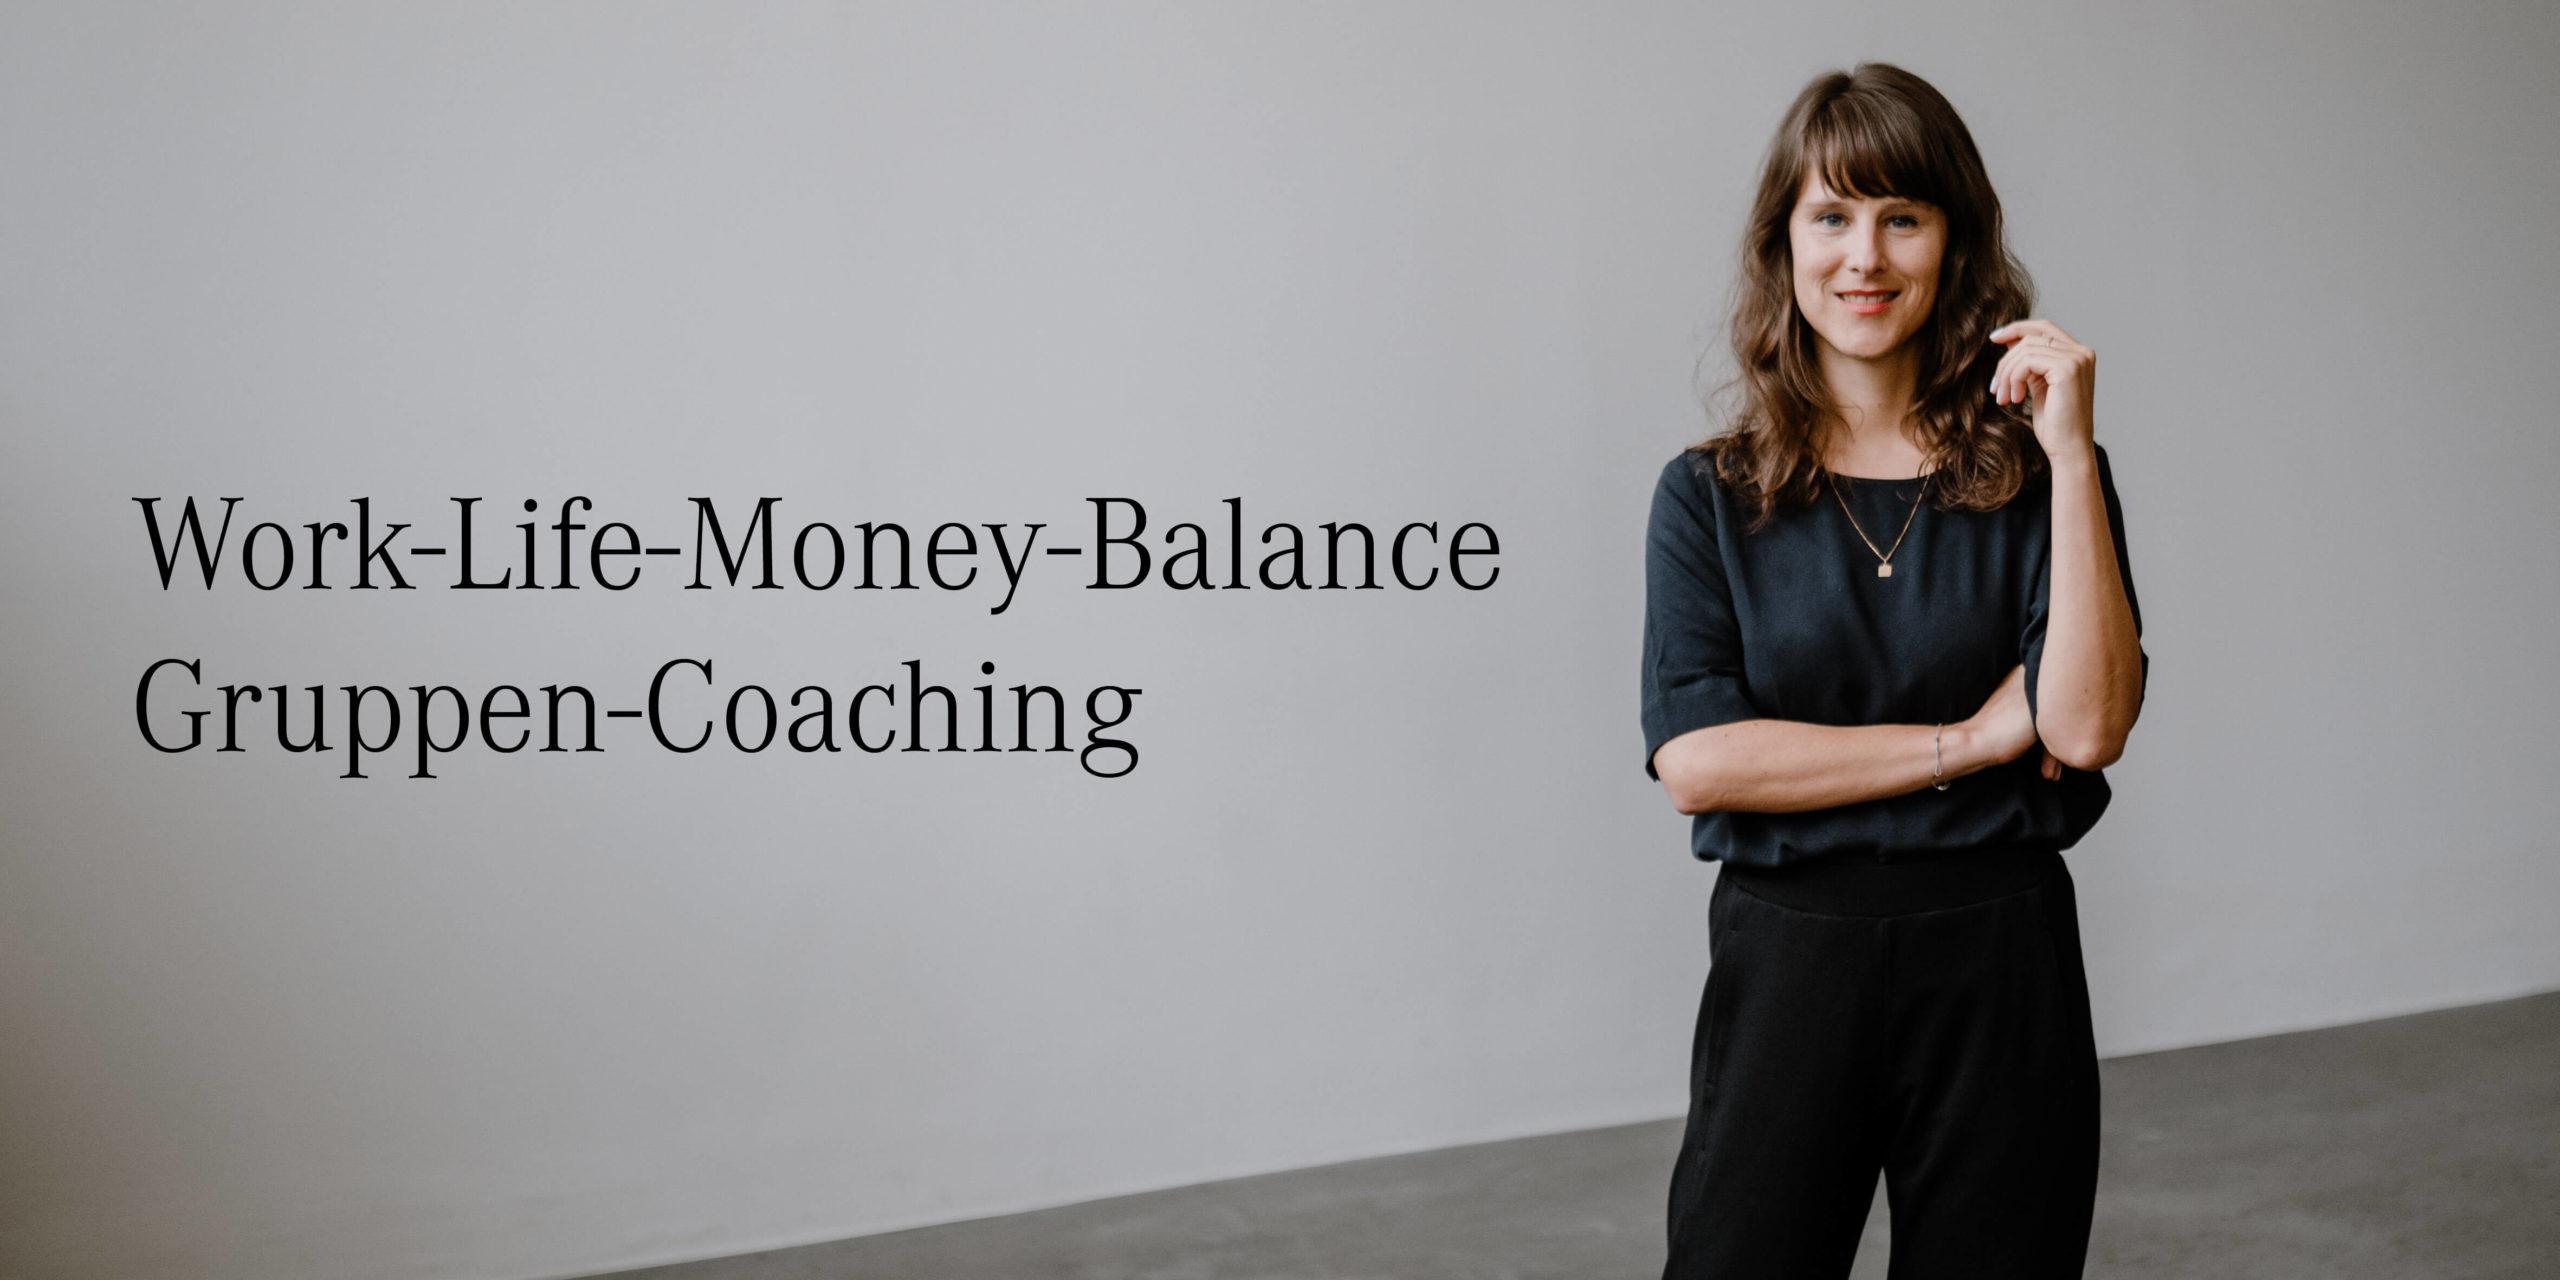 Gruppen-Coaching Work-Life-Money-Balance Yvonne Rundio